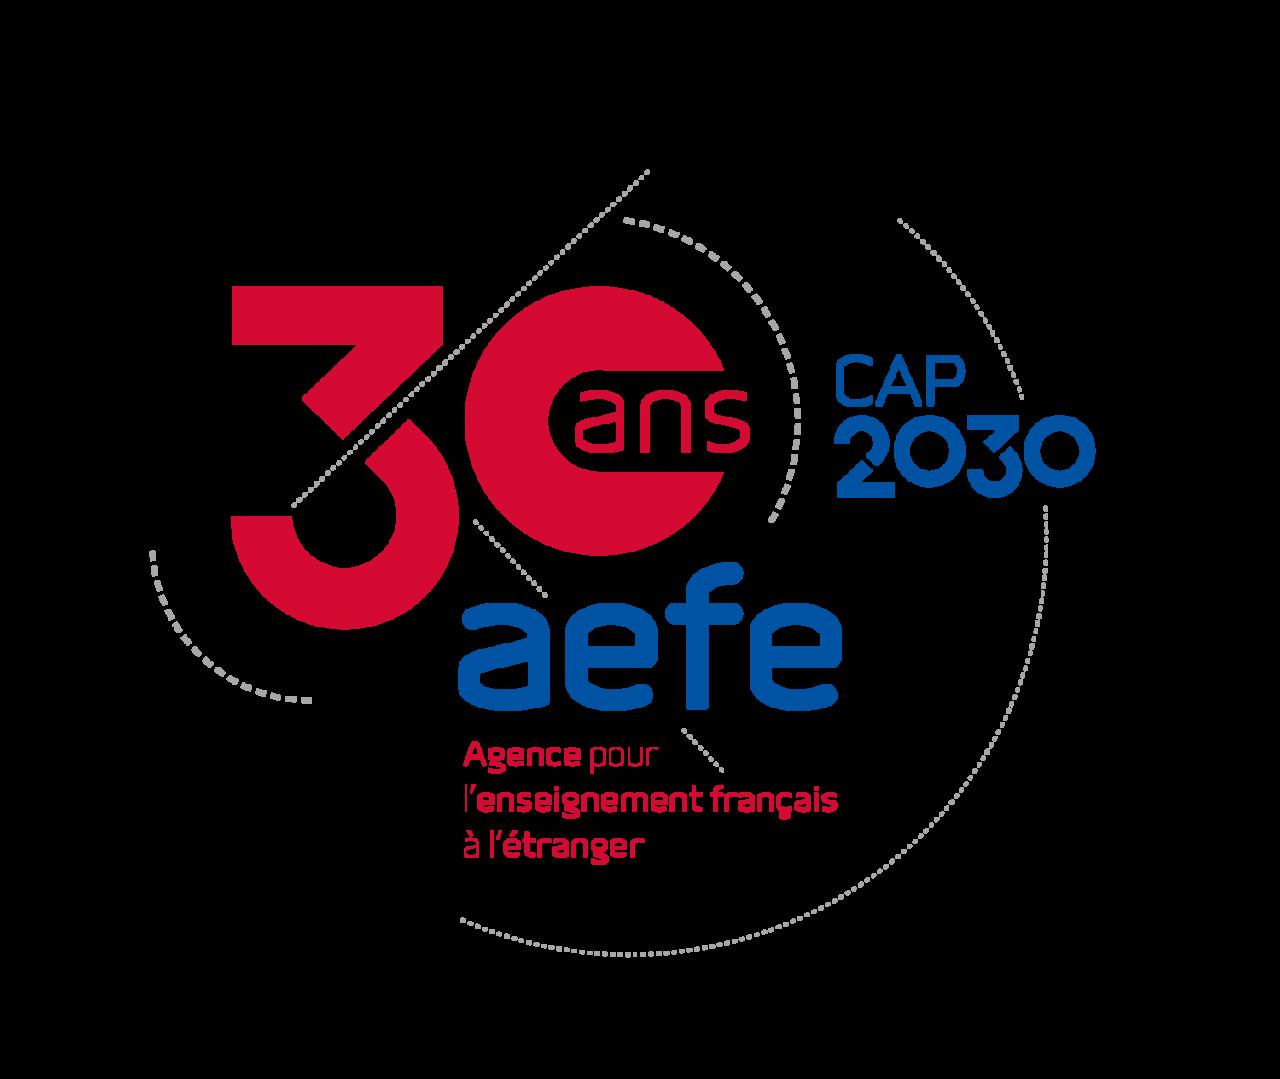 https://frederic-petit.eu/wp-content/uploads/2020/11/Logo-30-ans-AEFE-1280x1079.png